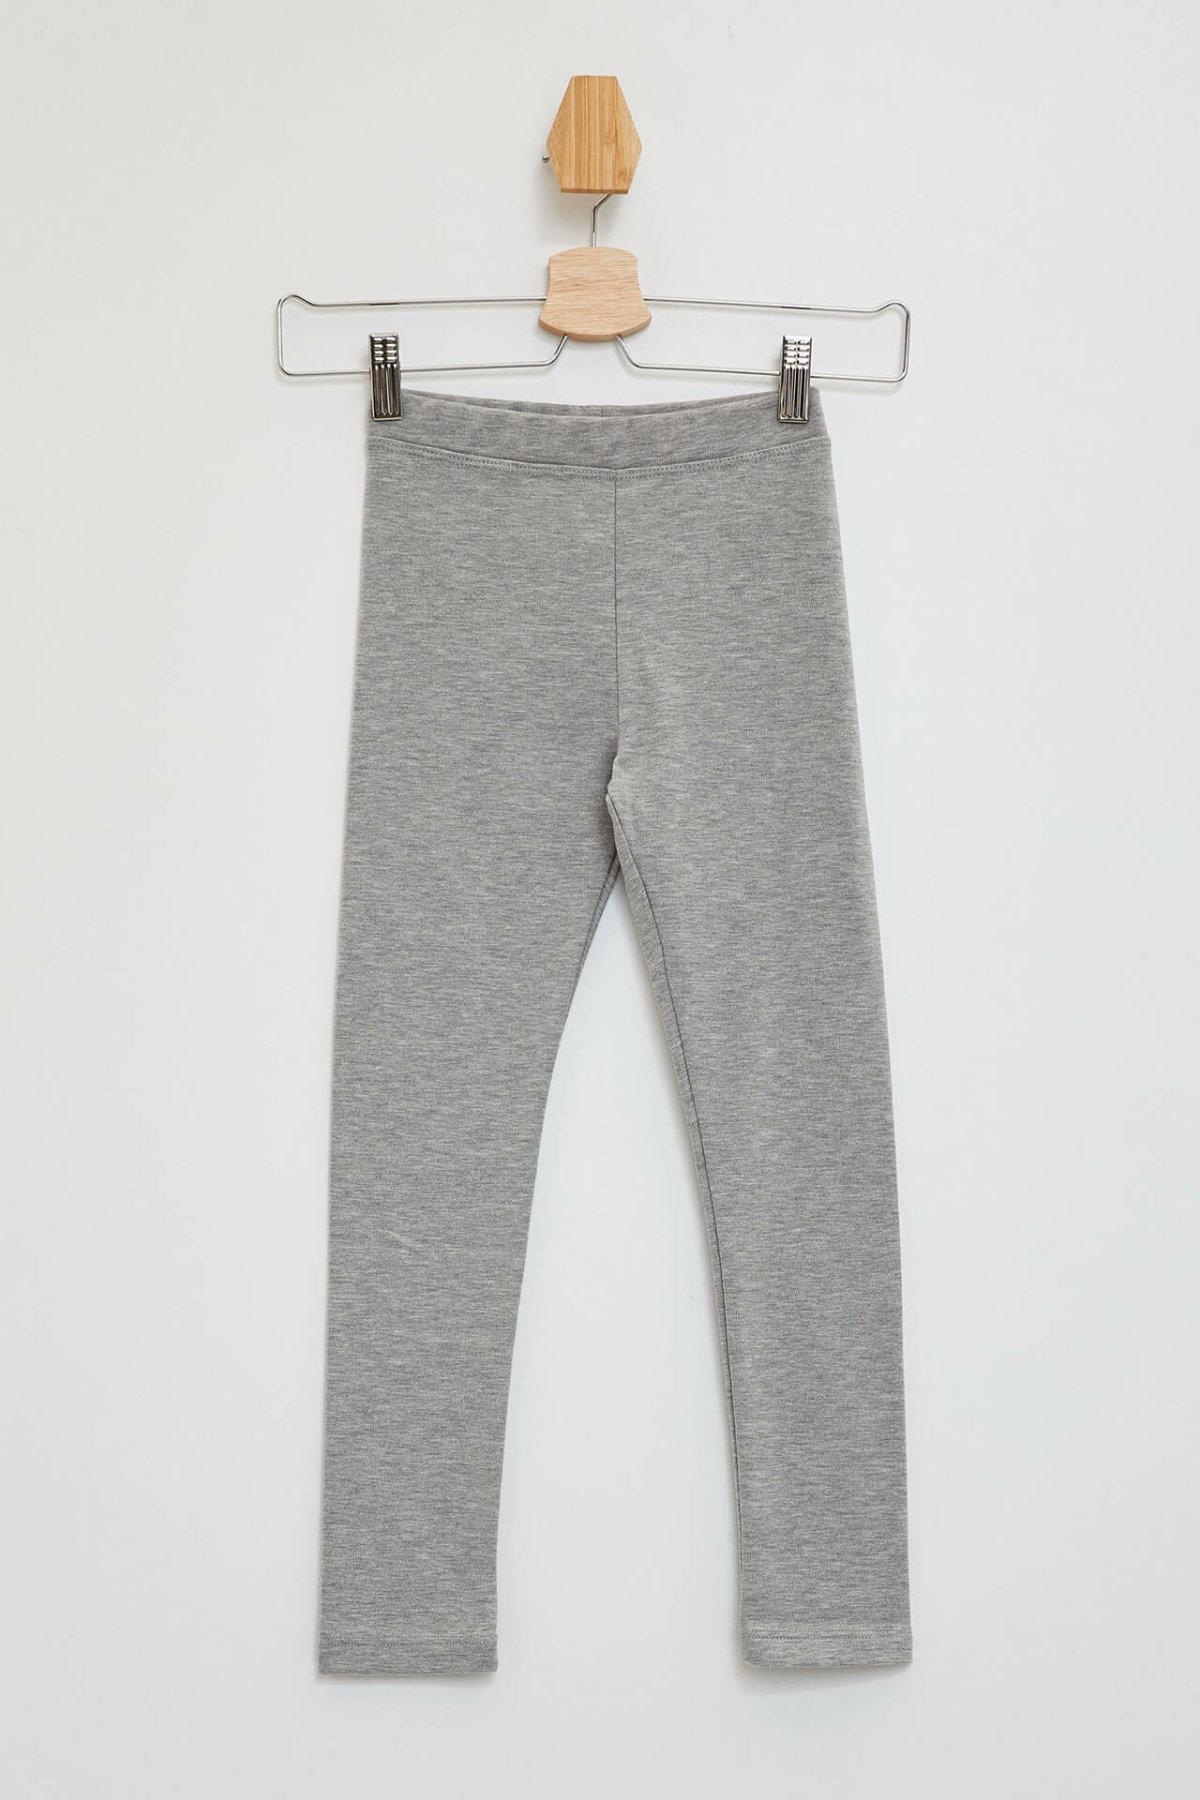 DeFacto Girl Leggings Kids Solid Color Leggings Casual Elastic Legging Pants For Girls Spring Autumn-M4227A619AU